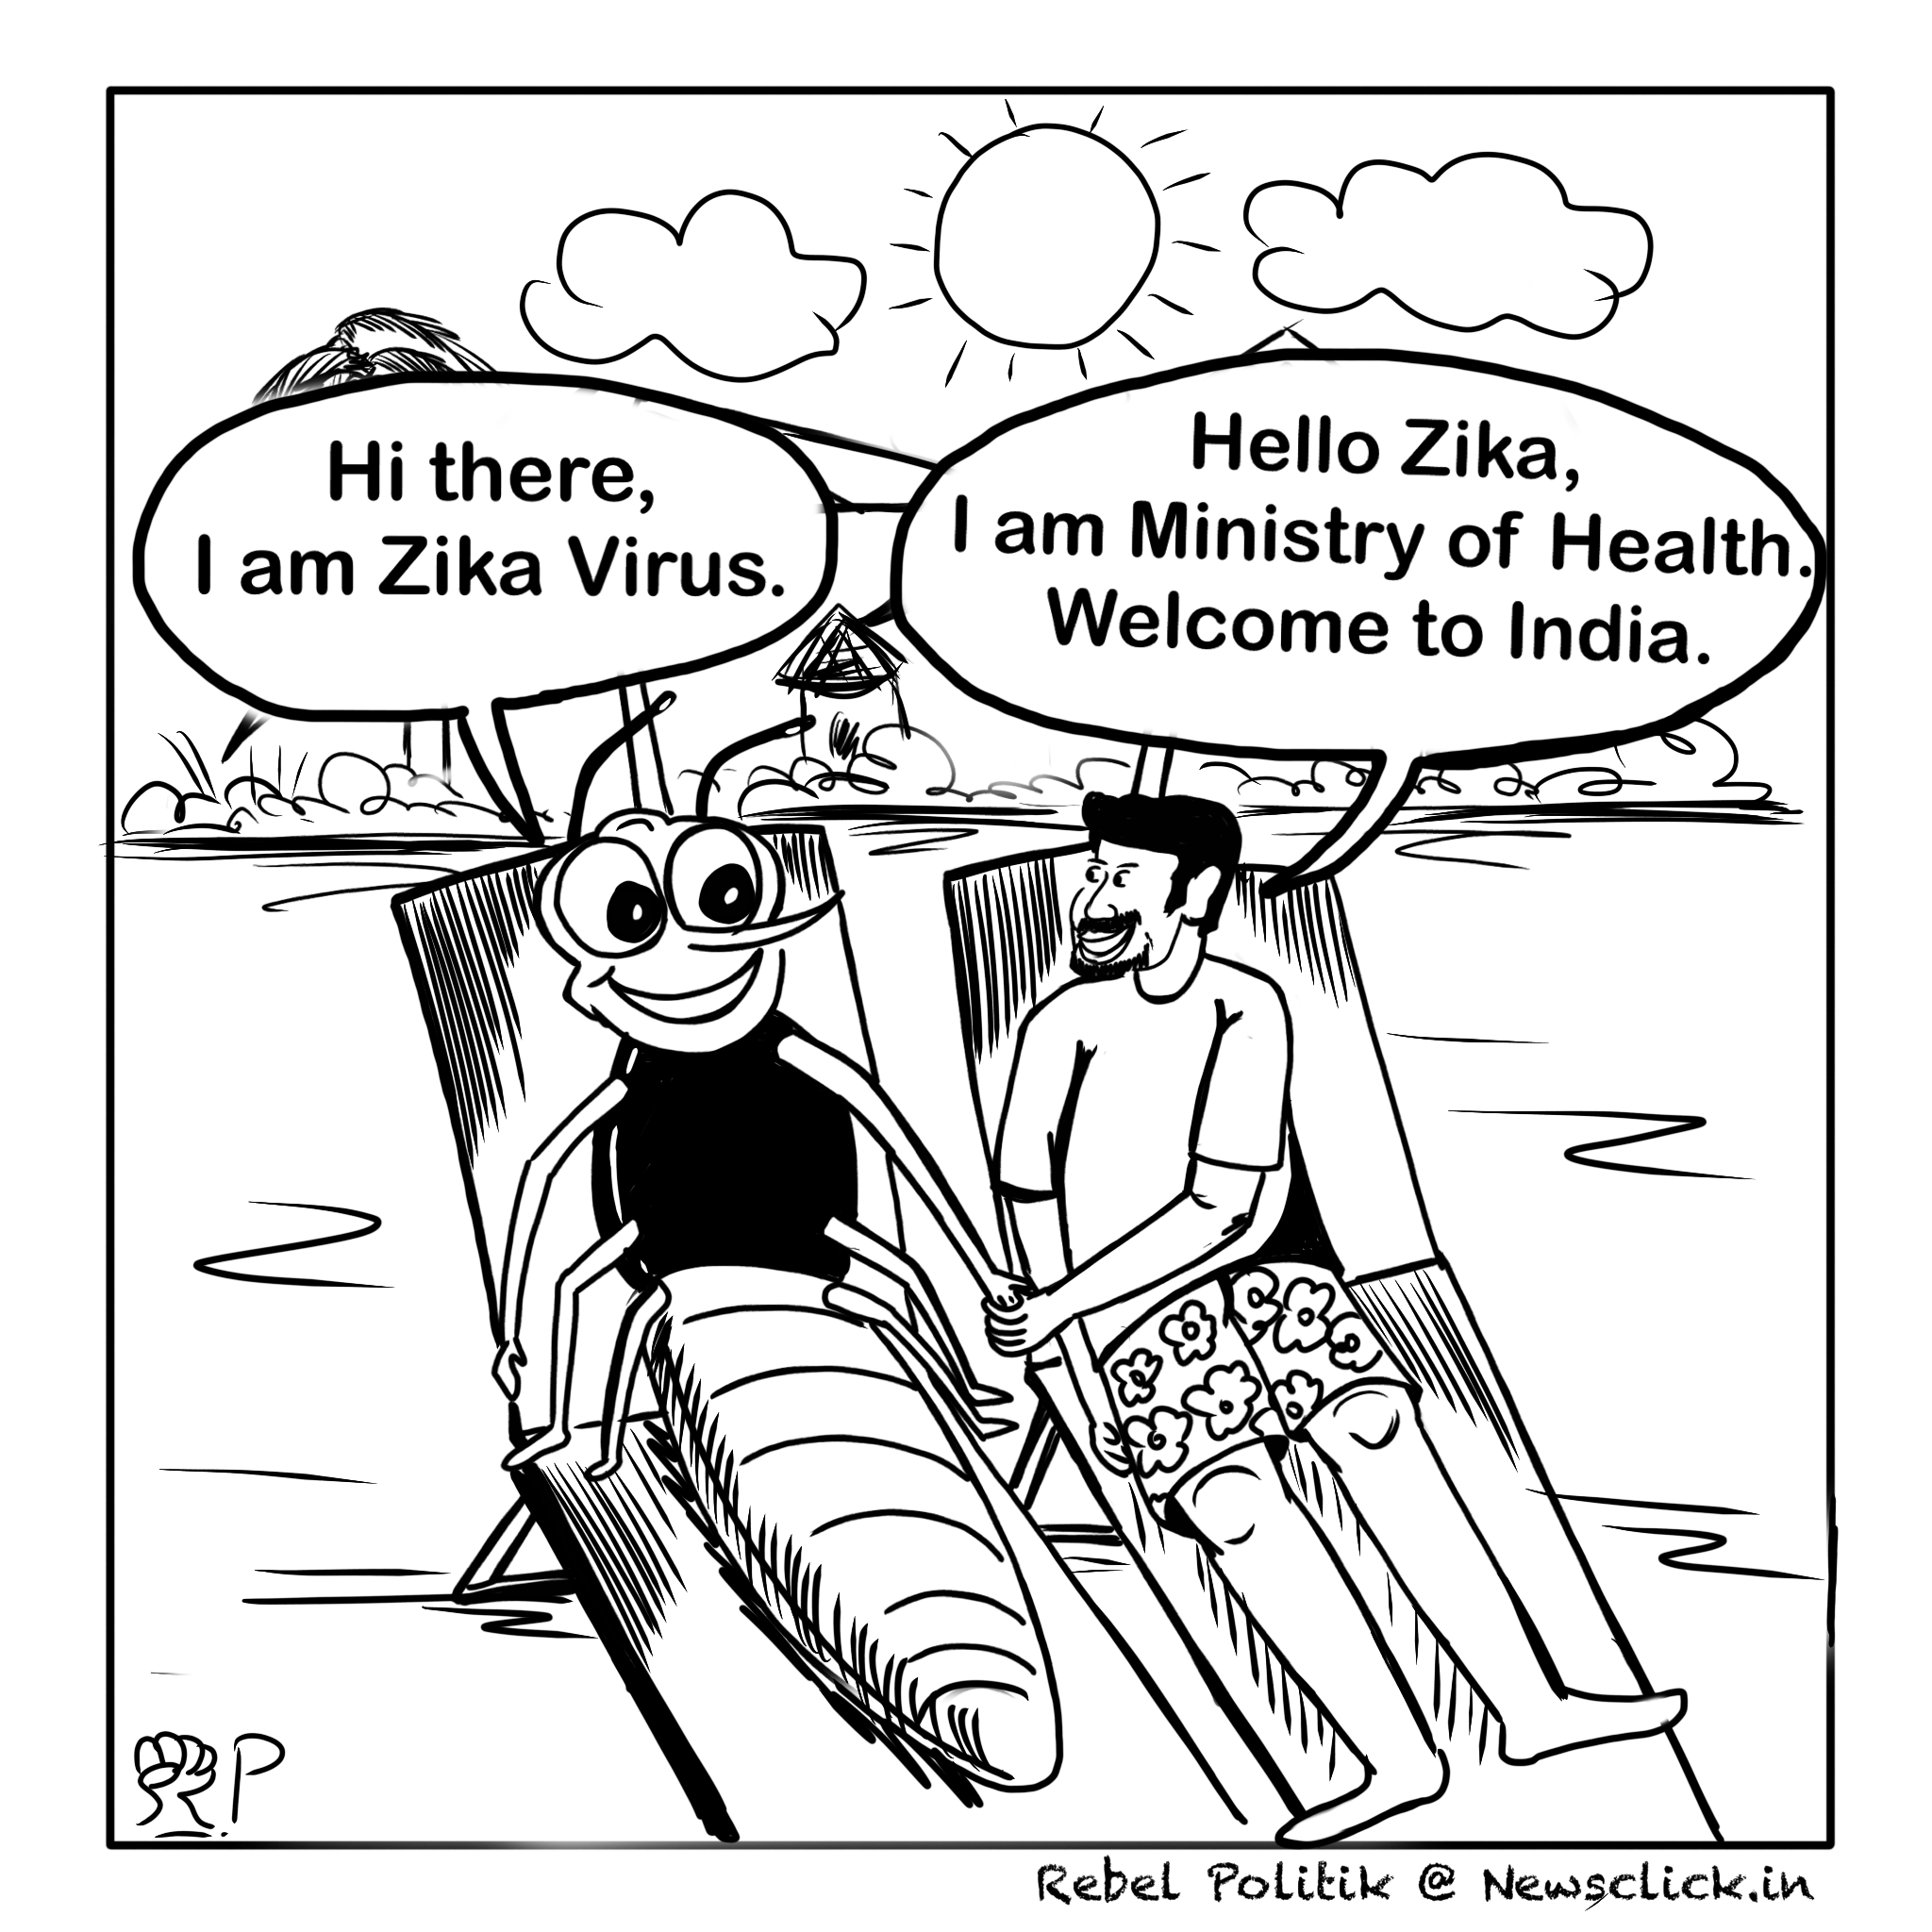 Viral News India: Zika Virus In India: Health Ministry Takes No Action